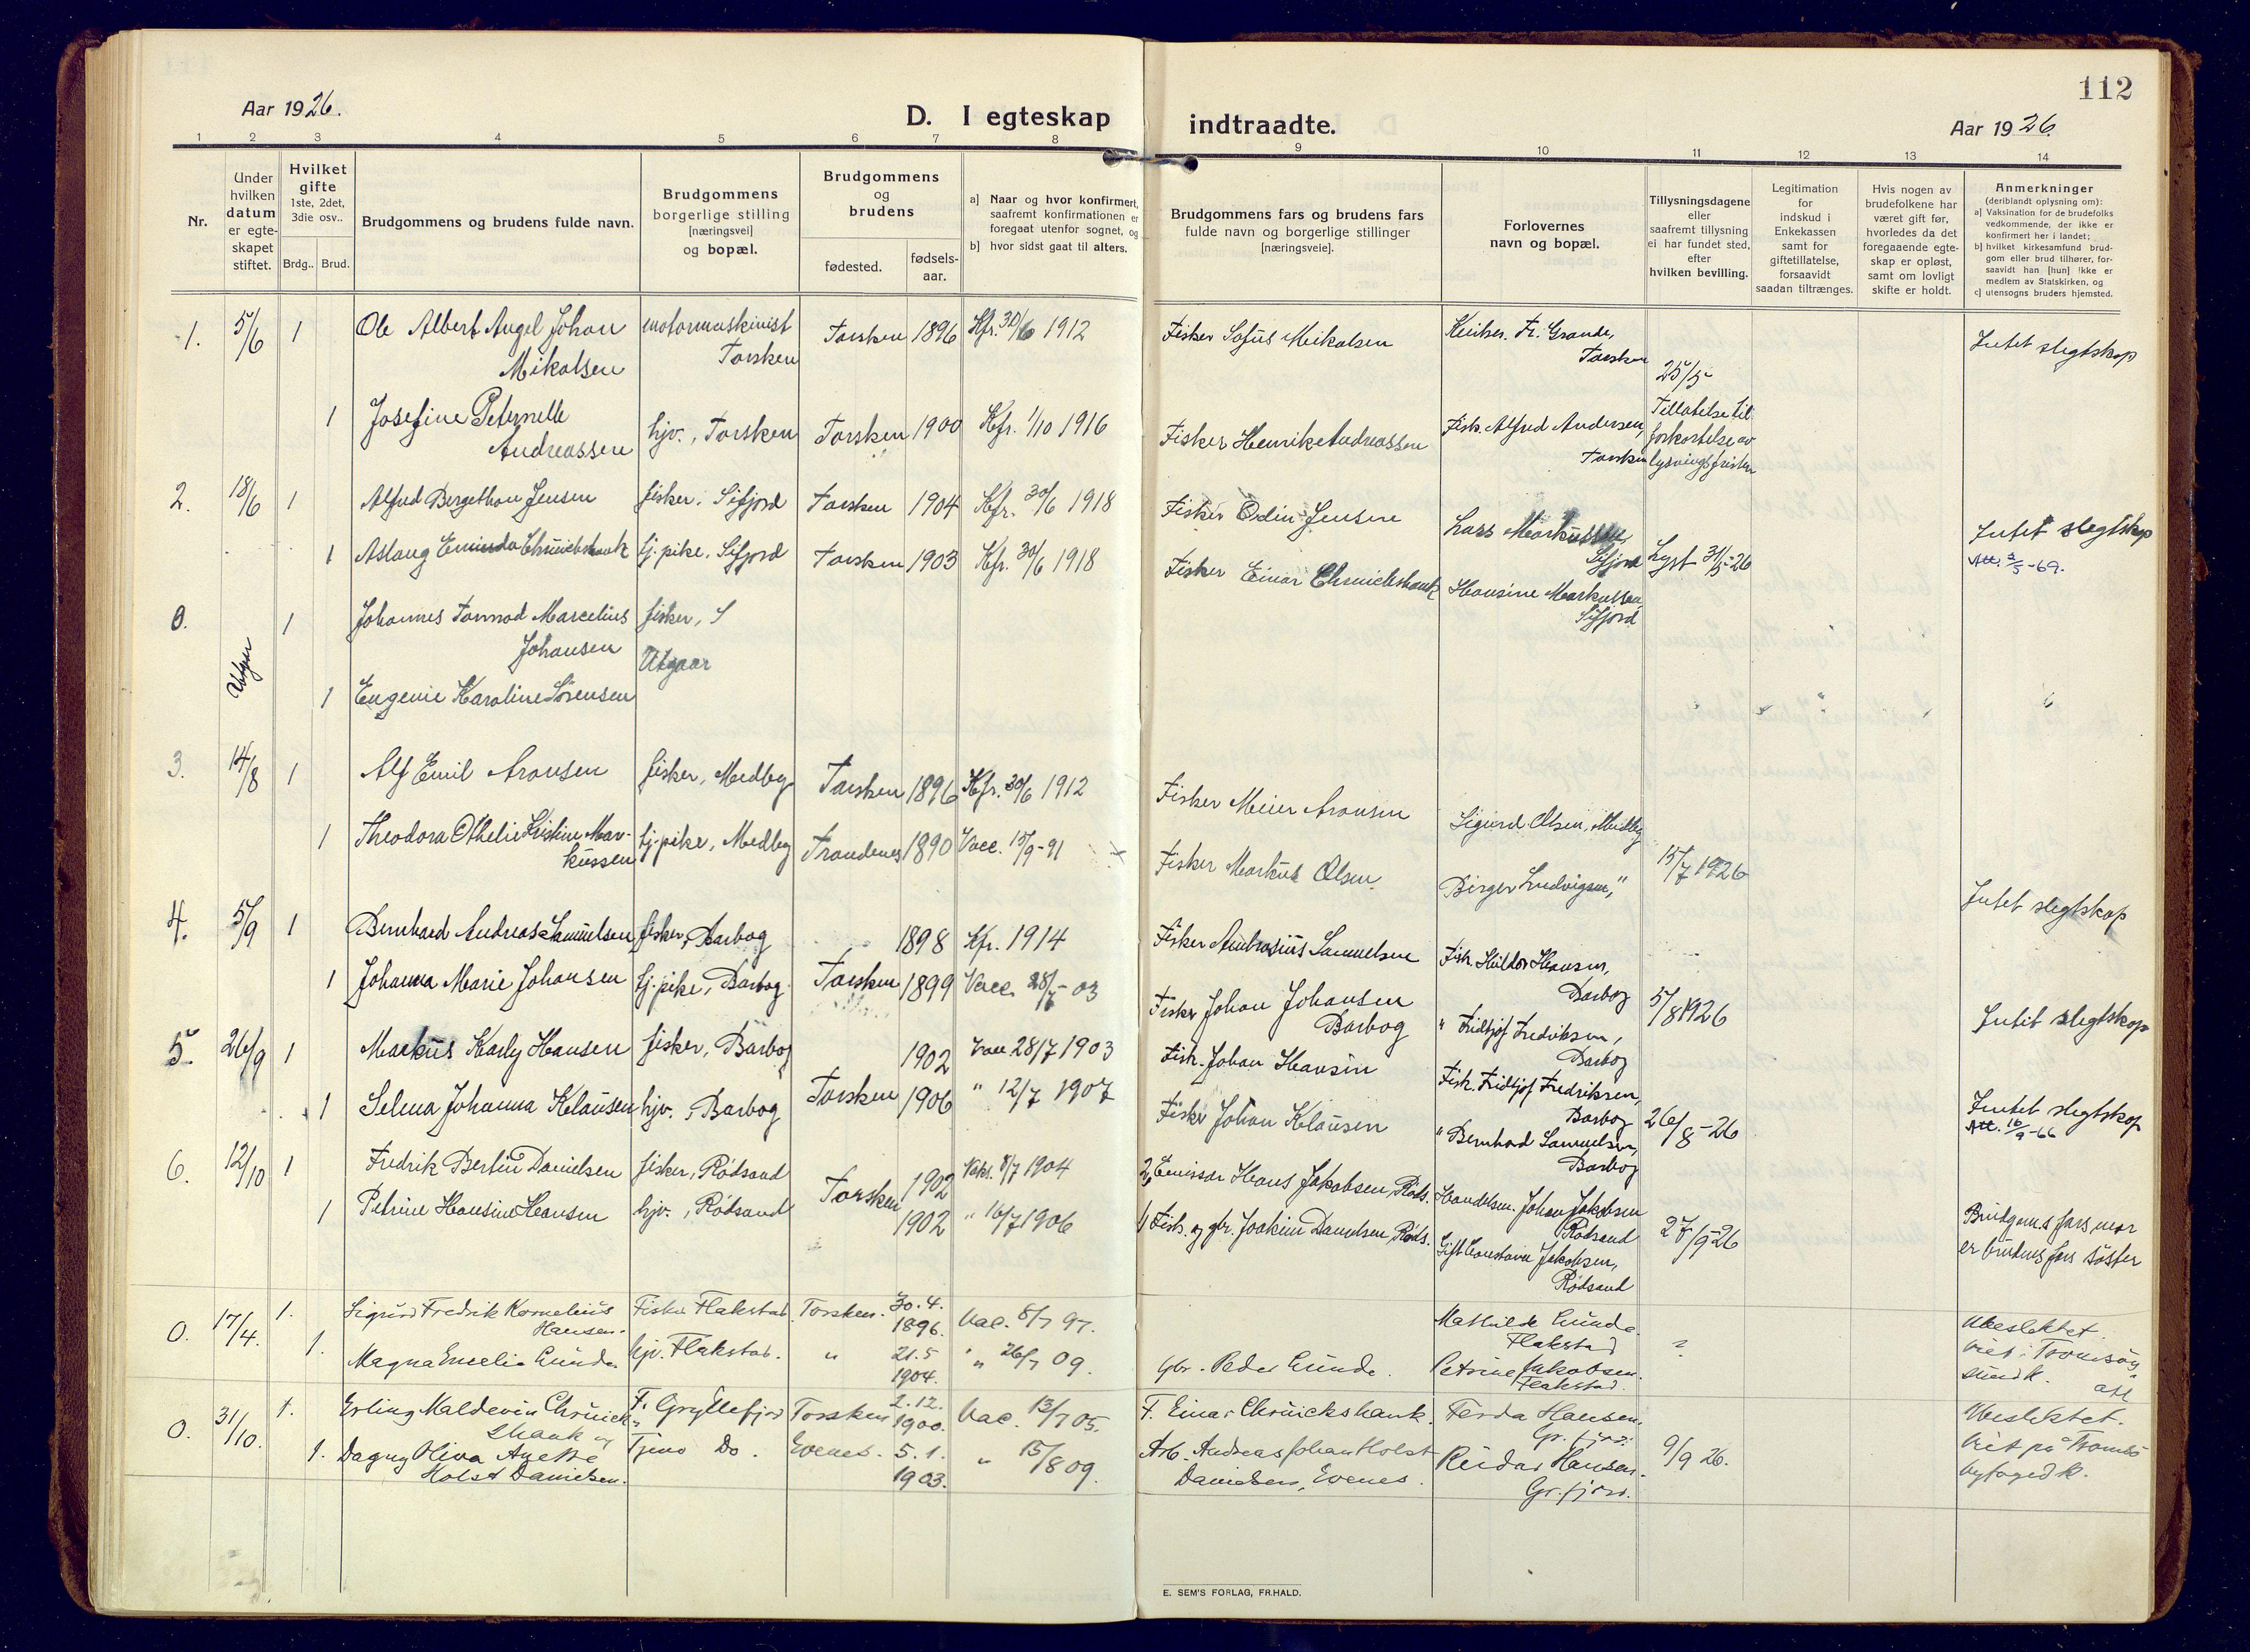 SATØ, Mefjord/Berg sokneprestkontor, G/Ga/Gaa: Ministerialbok nr. 10, 1916-1928, s. 112